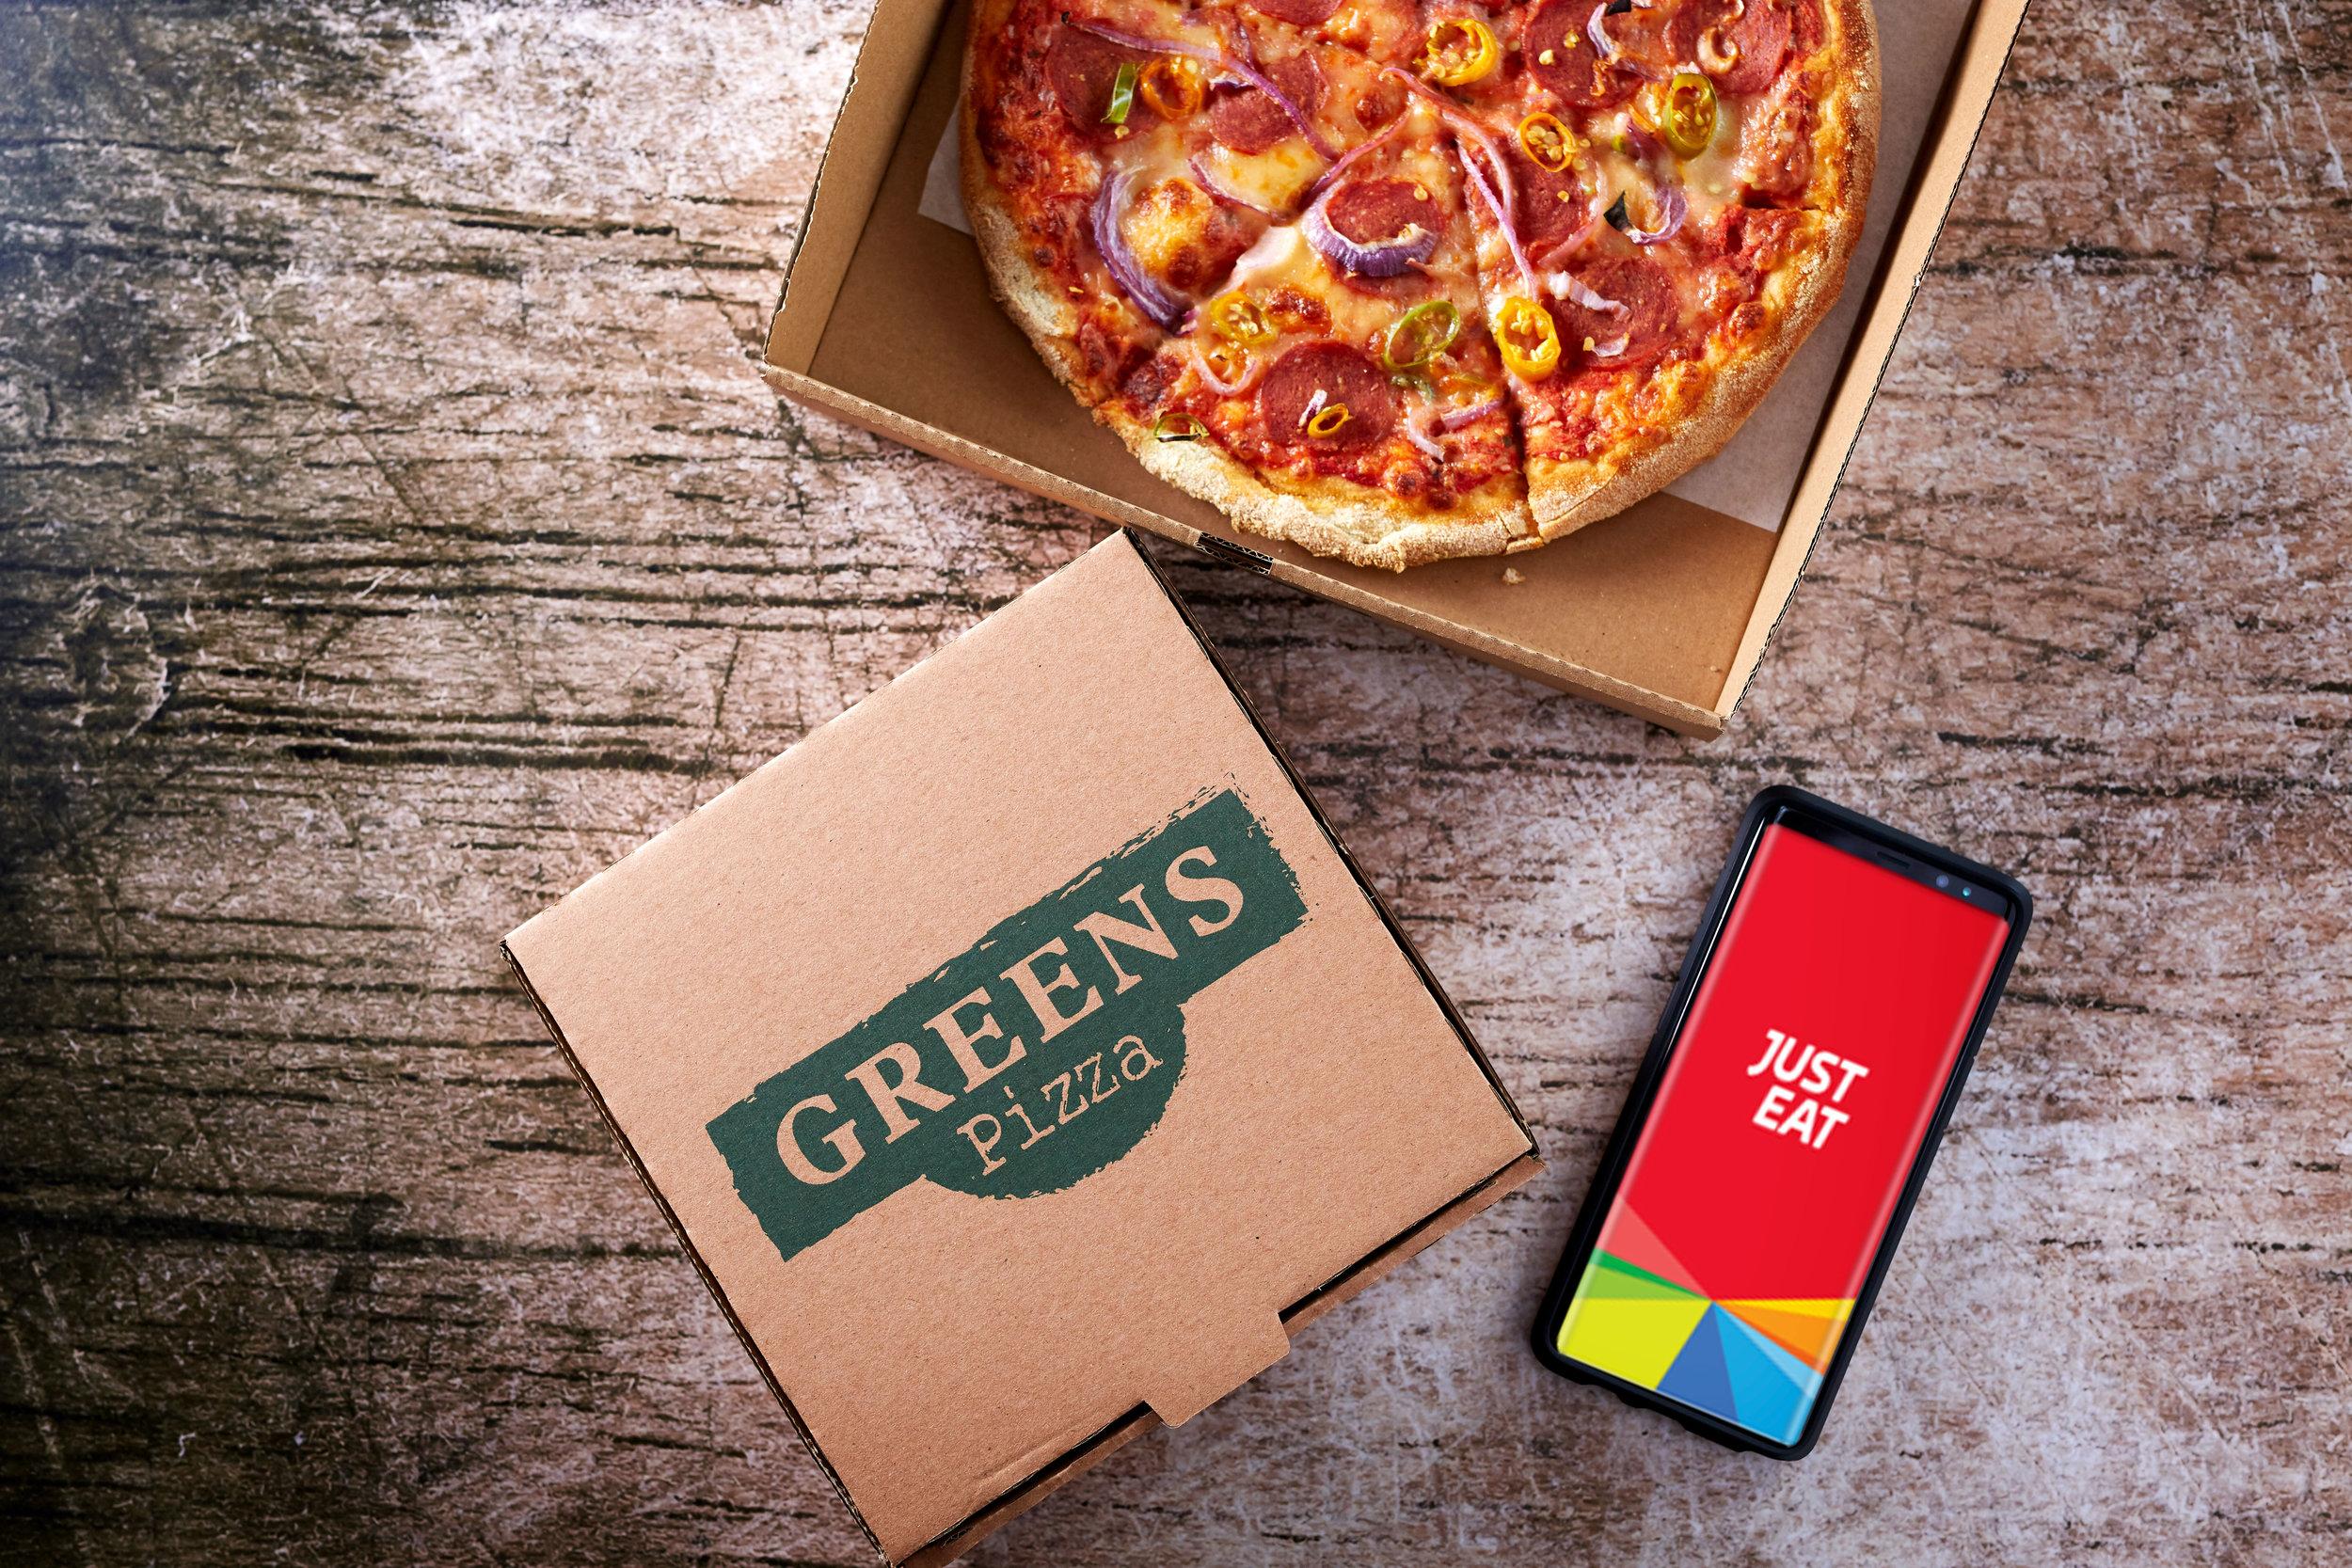 Green's-Pizza-22-03-2019-56.jpg